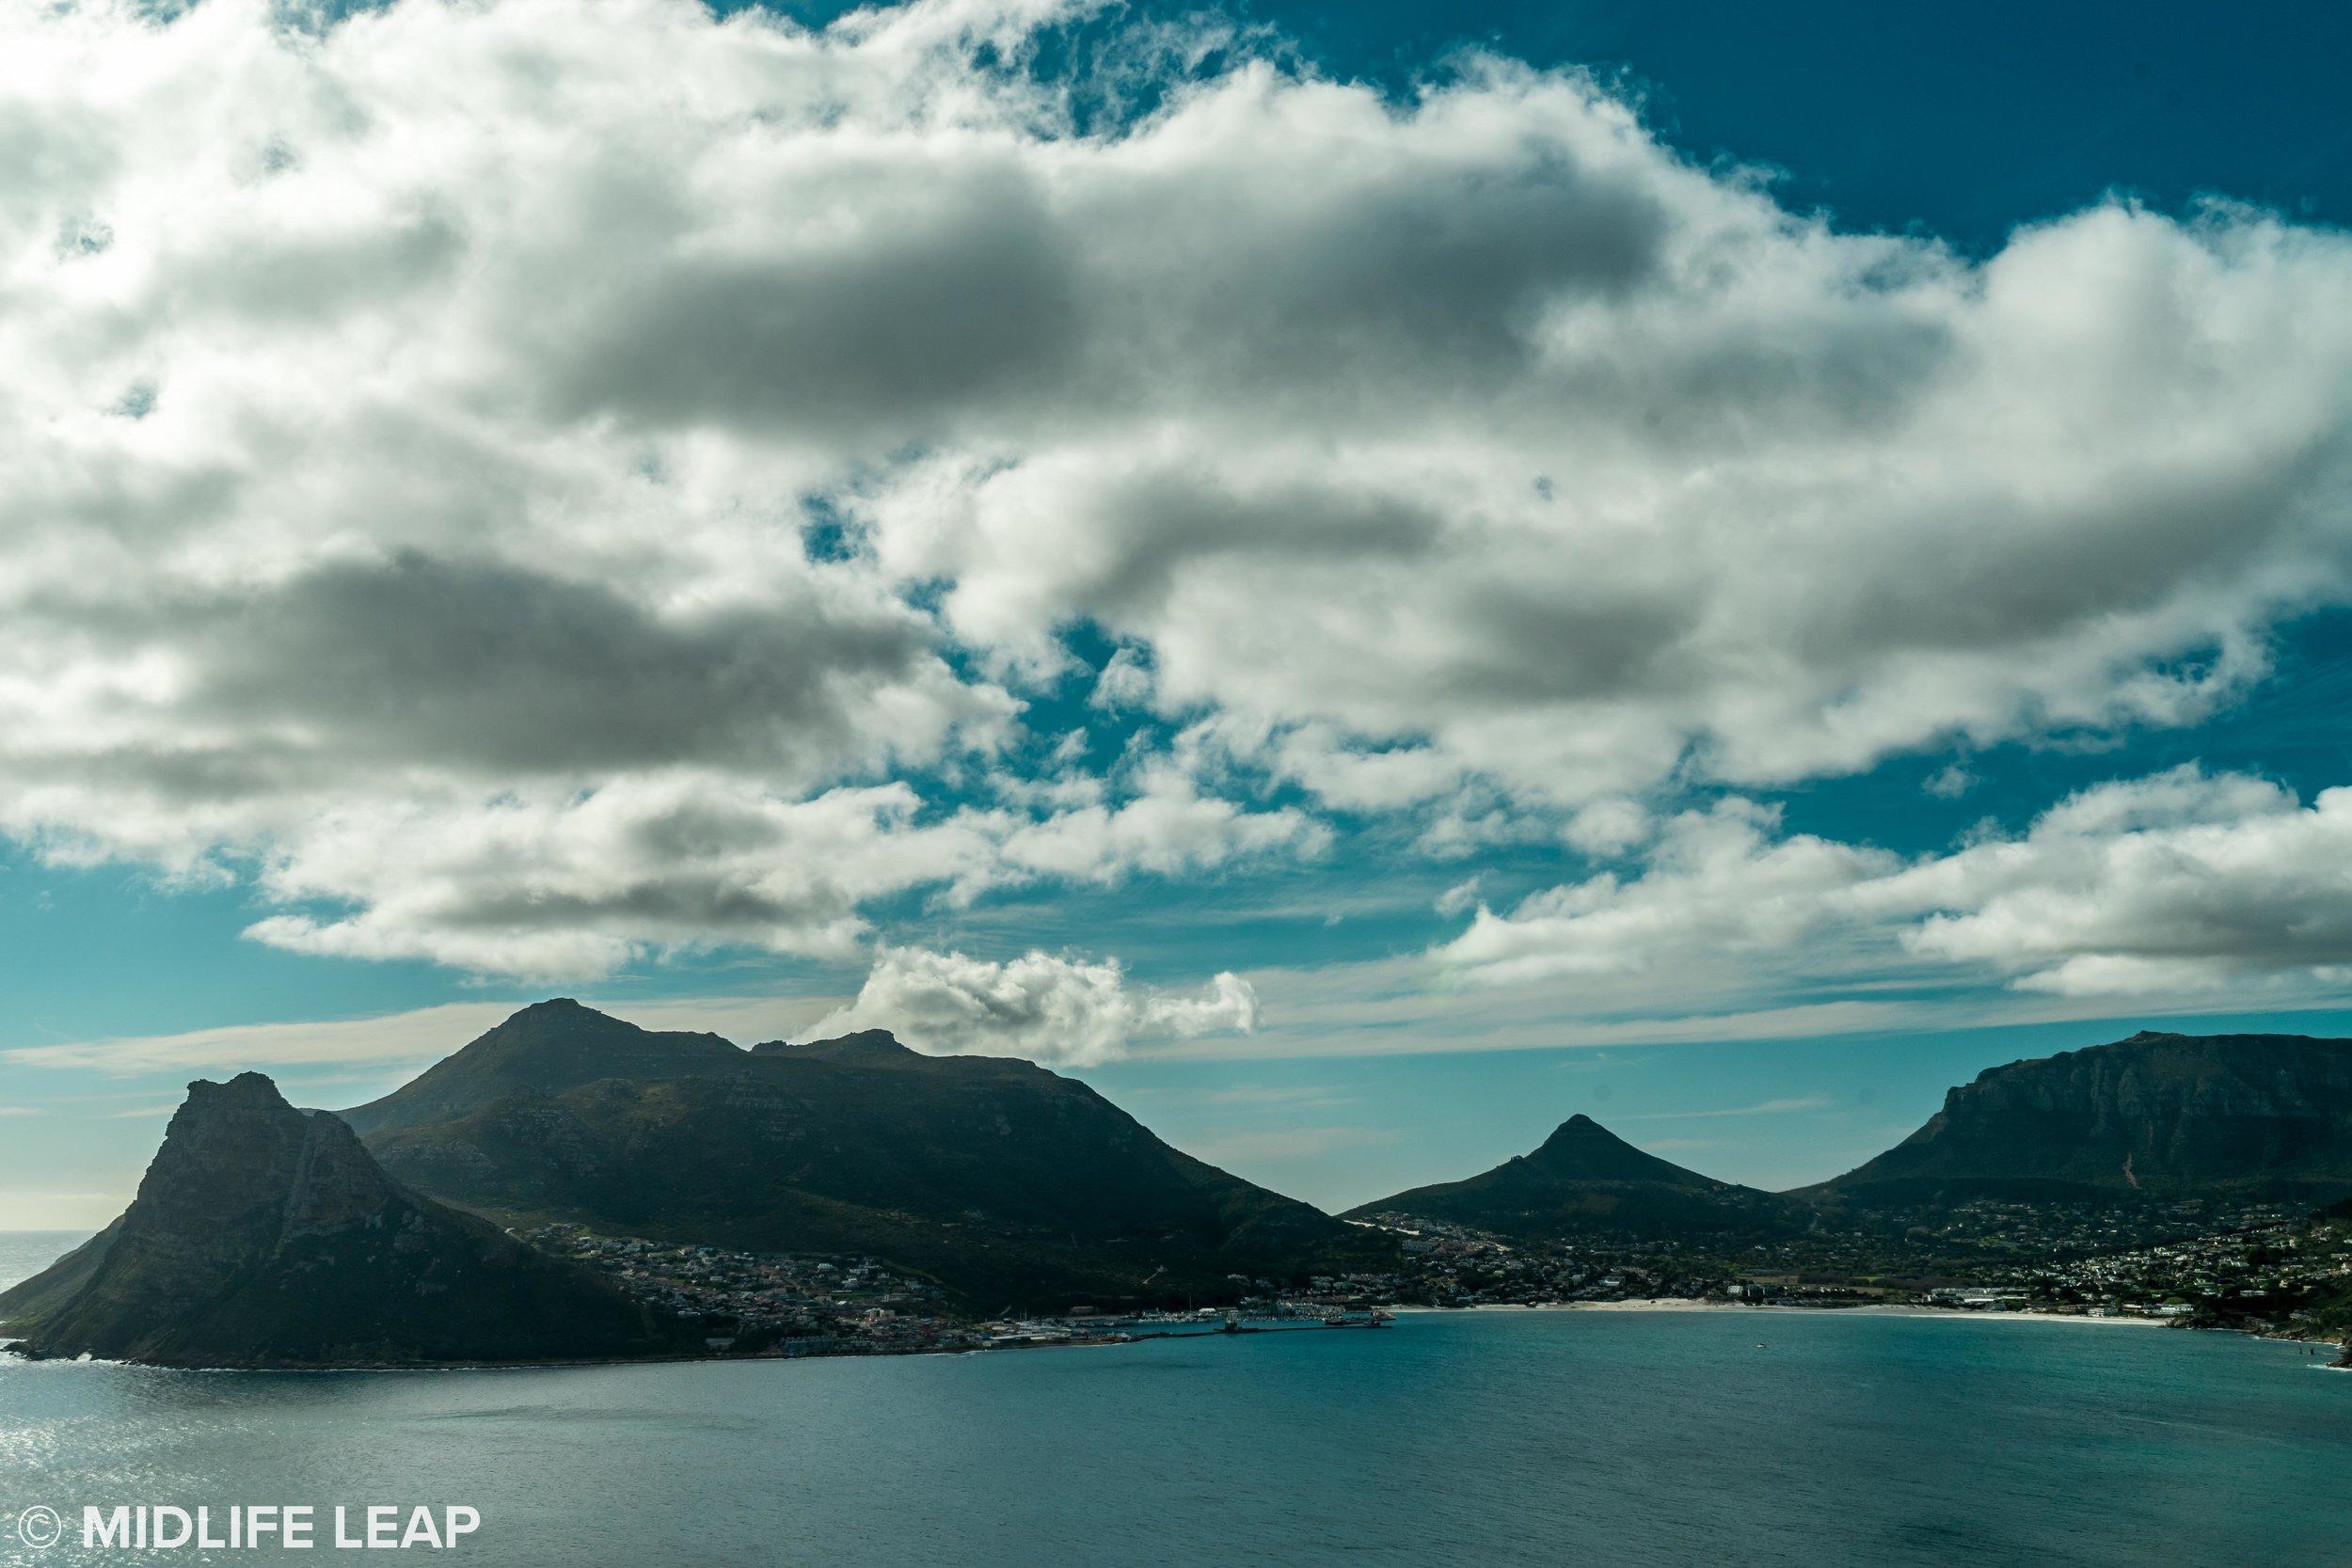 chapmans-peak-south-africa-m6